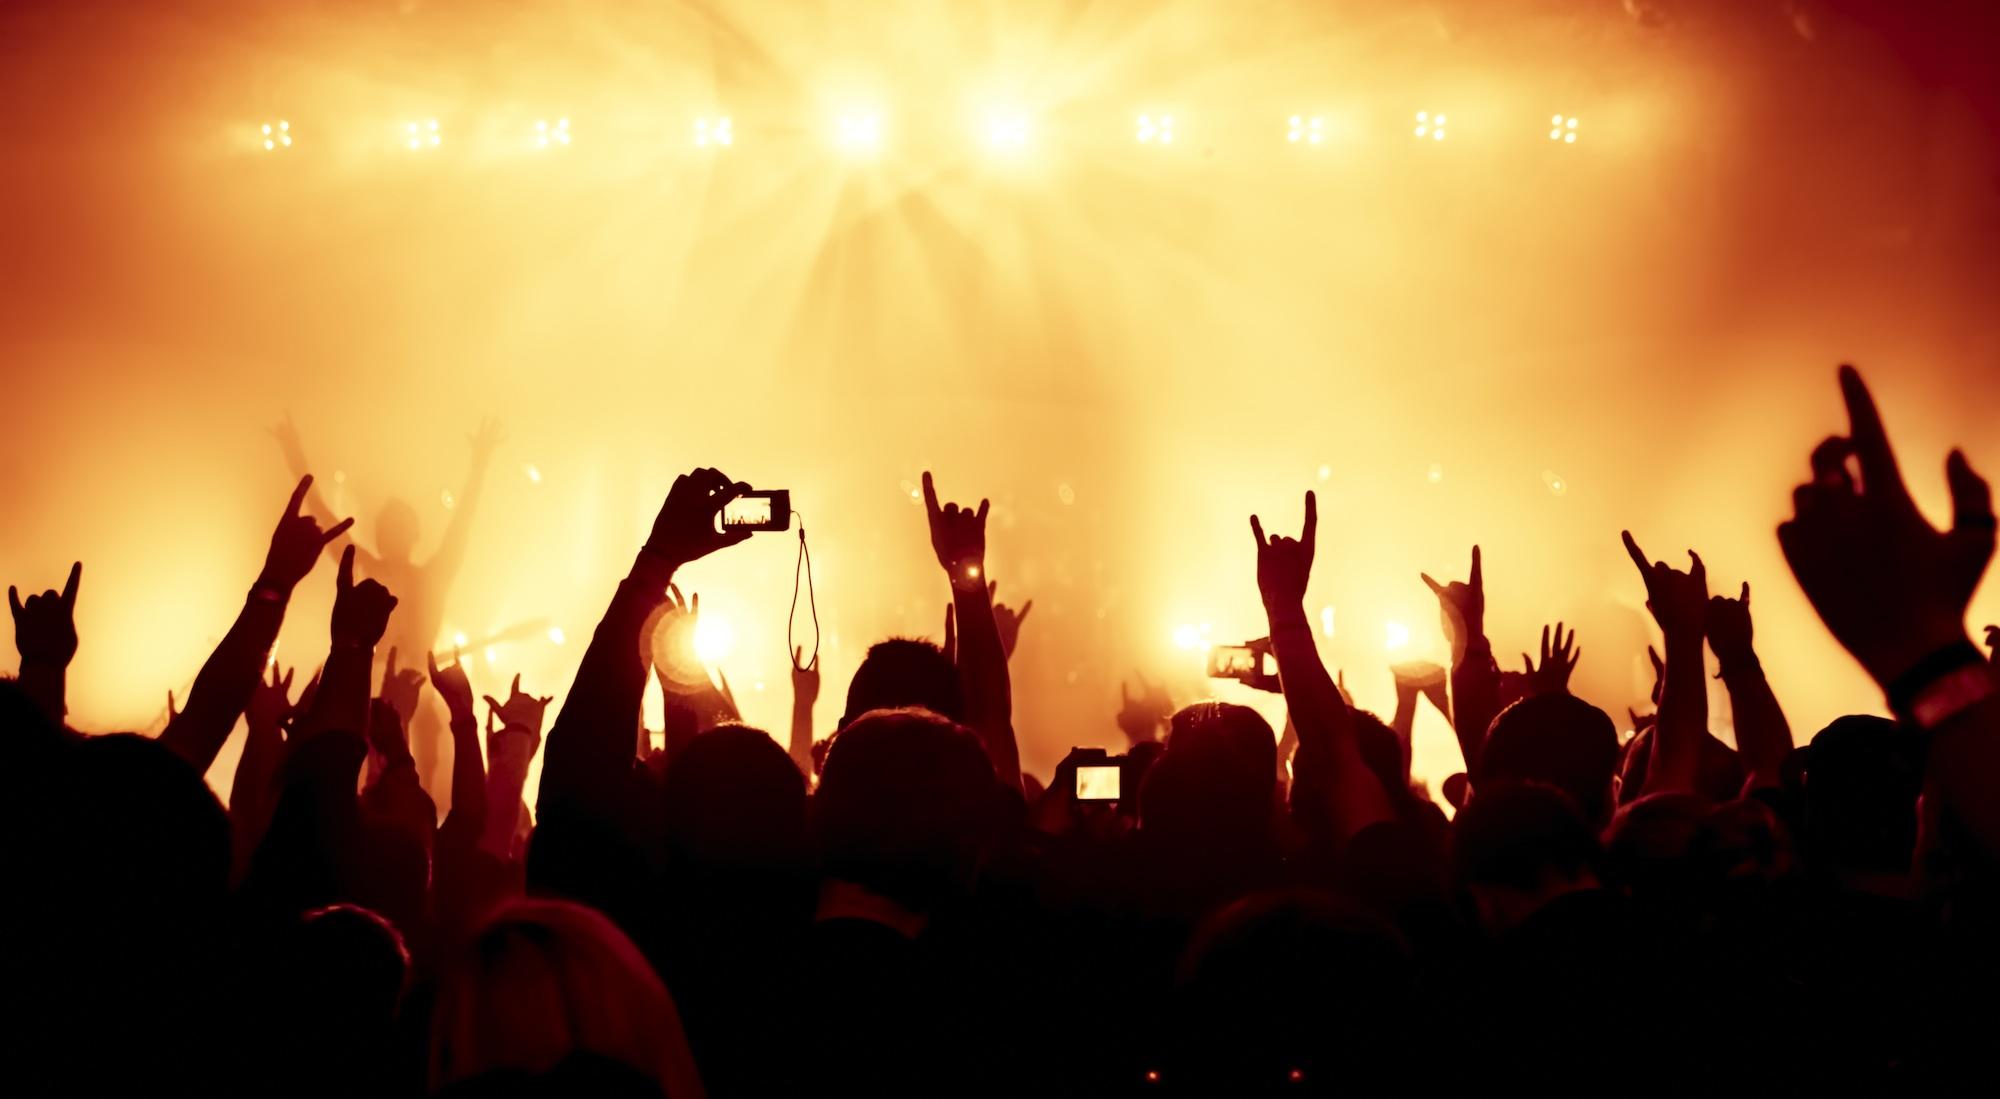 635920511126452946-2123257064_concert-audience